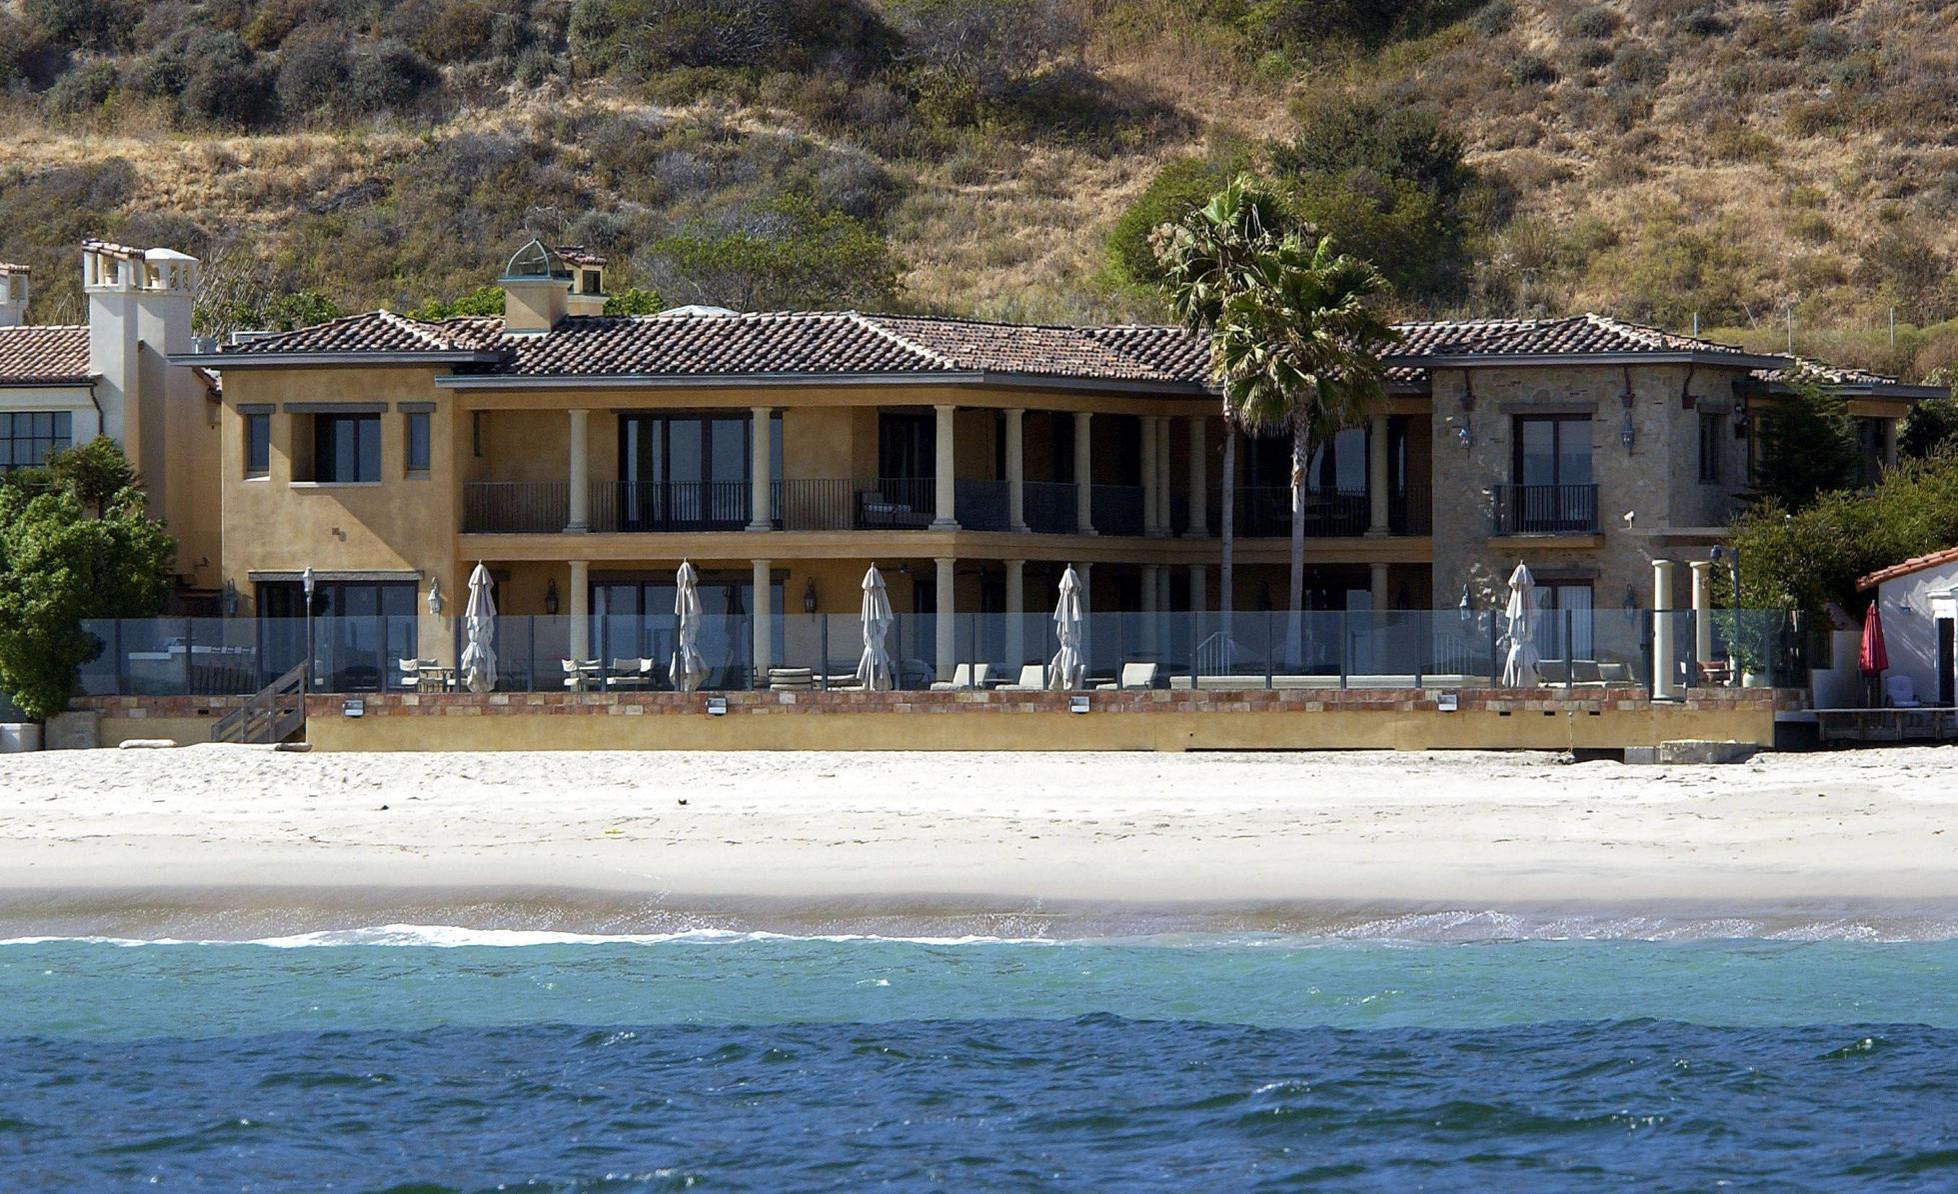 Computer tycoon Larry Ellison's Malibu home